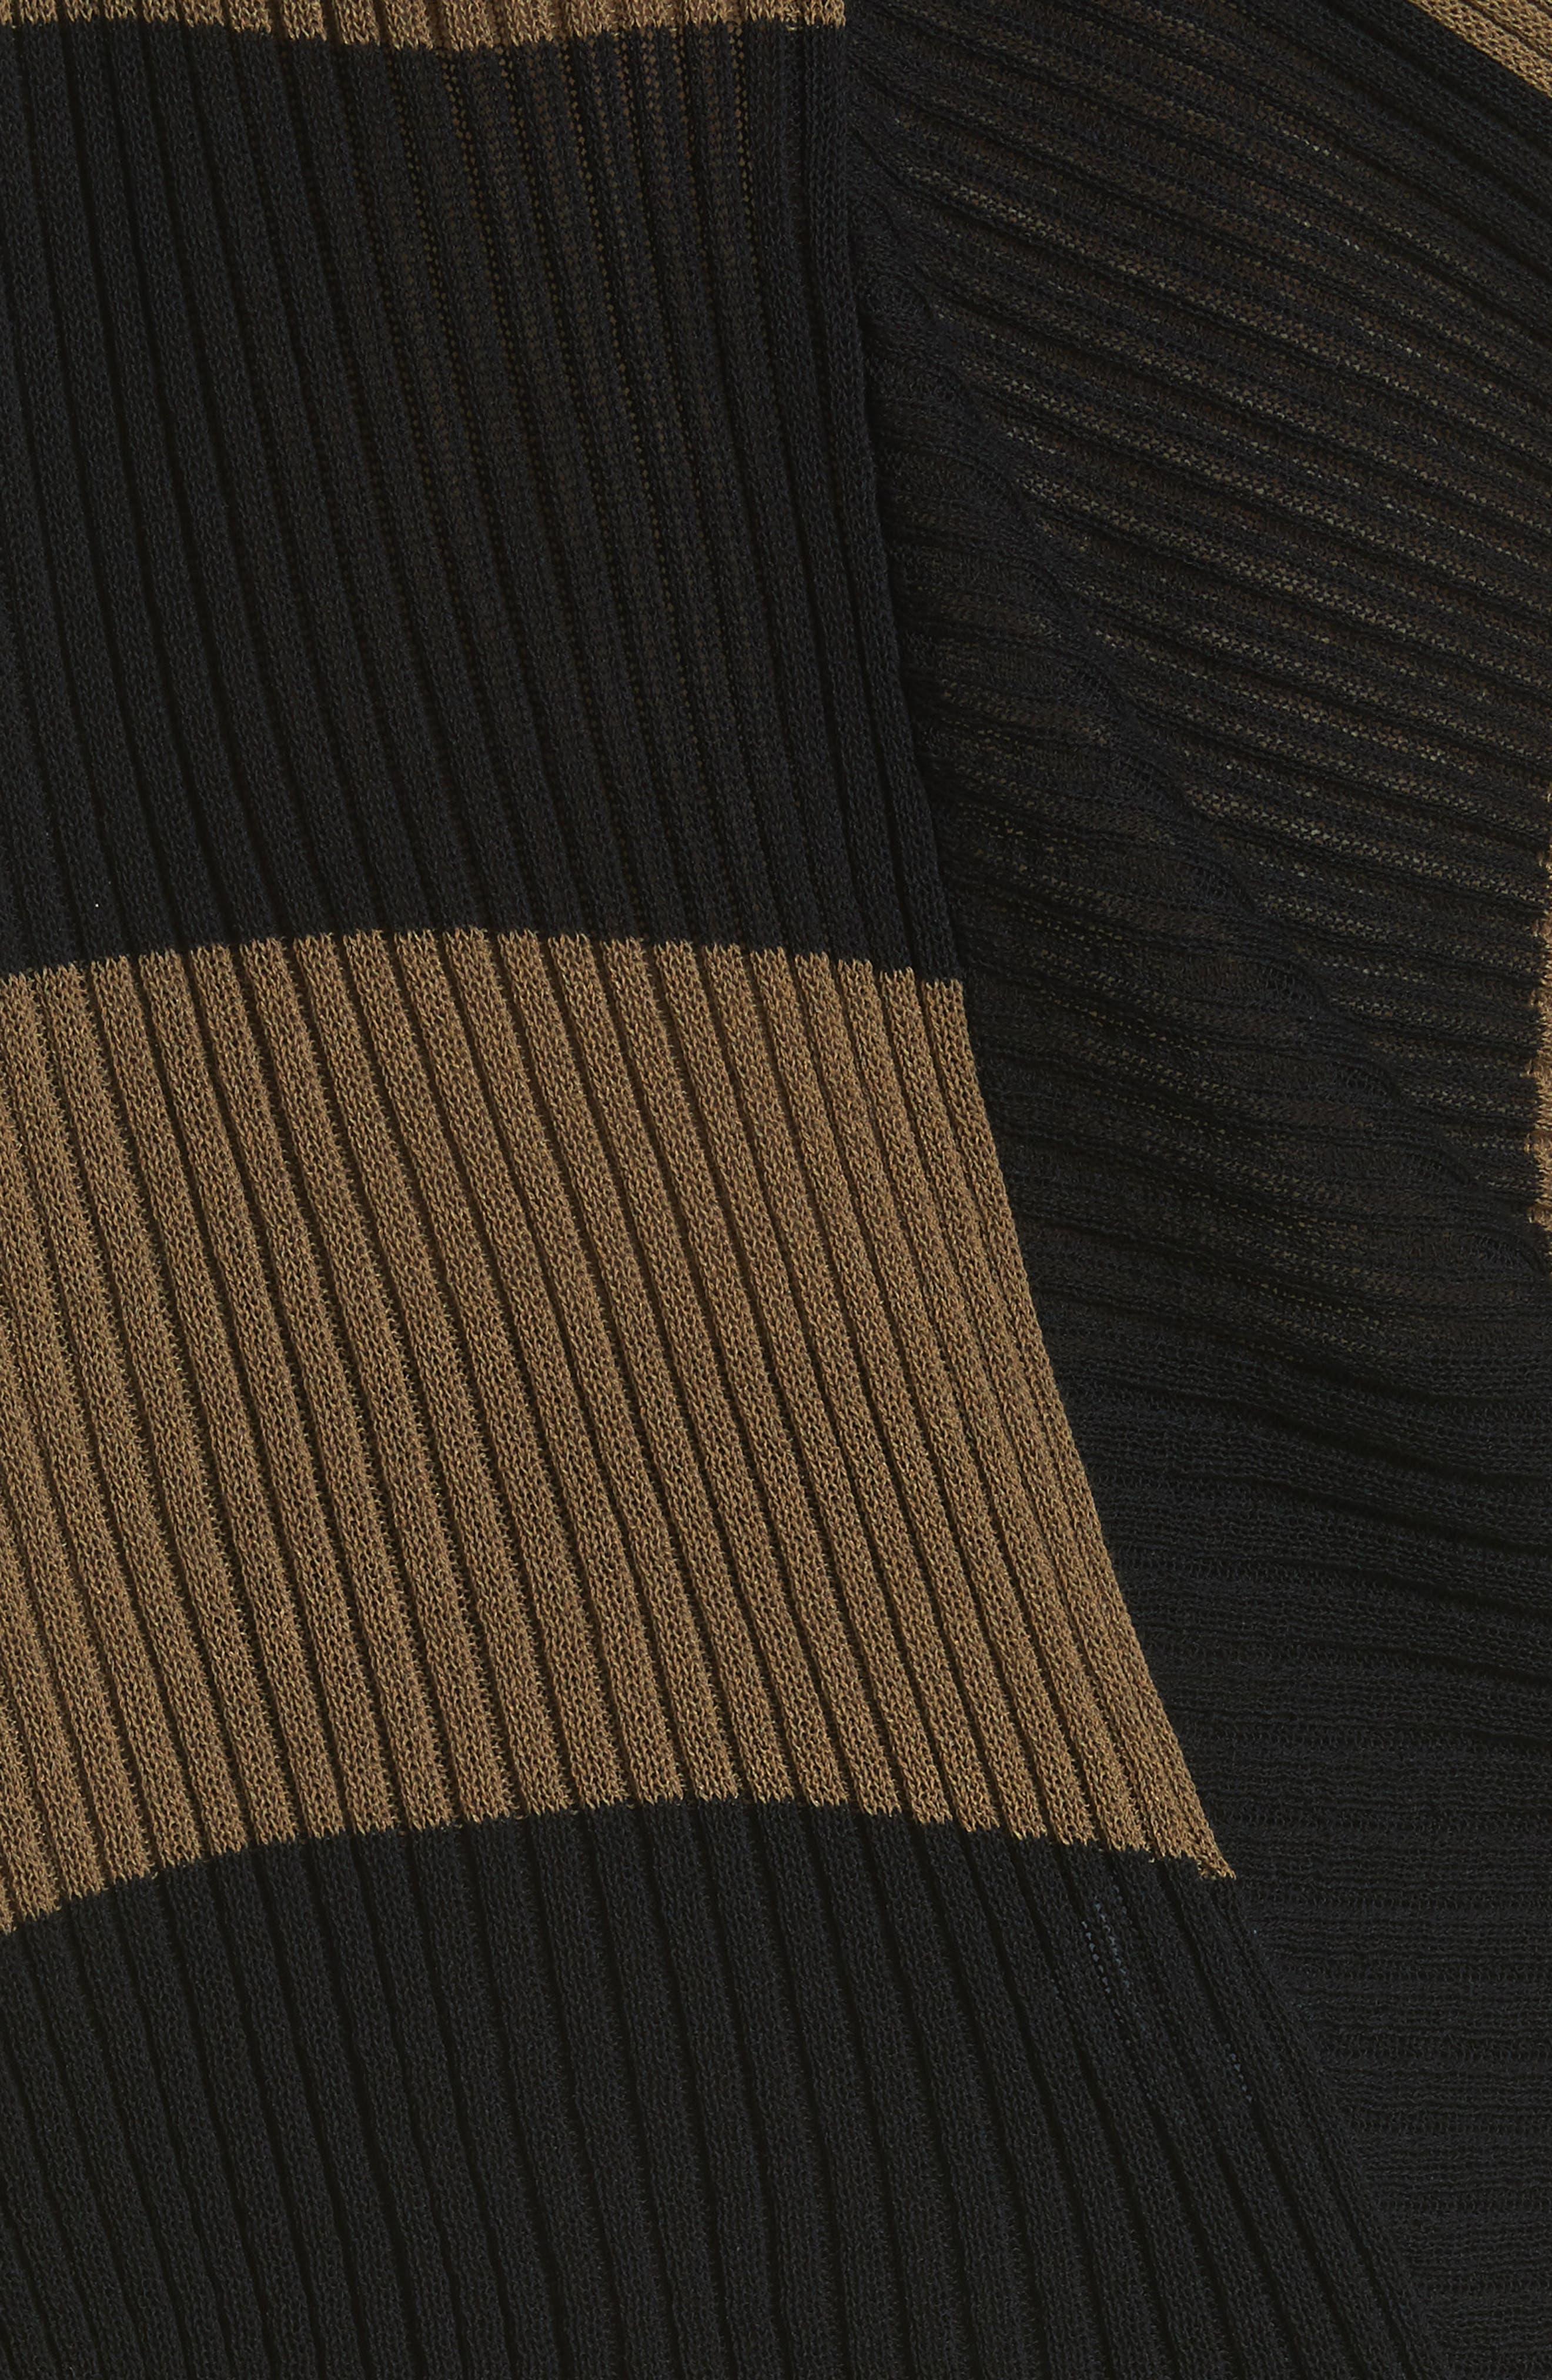 Marques'Almeida Draped One Sleeve Sweater,                             Alternate thumbnail 5, color,                             200